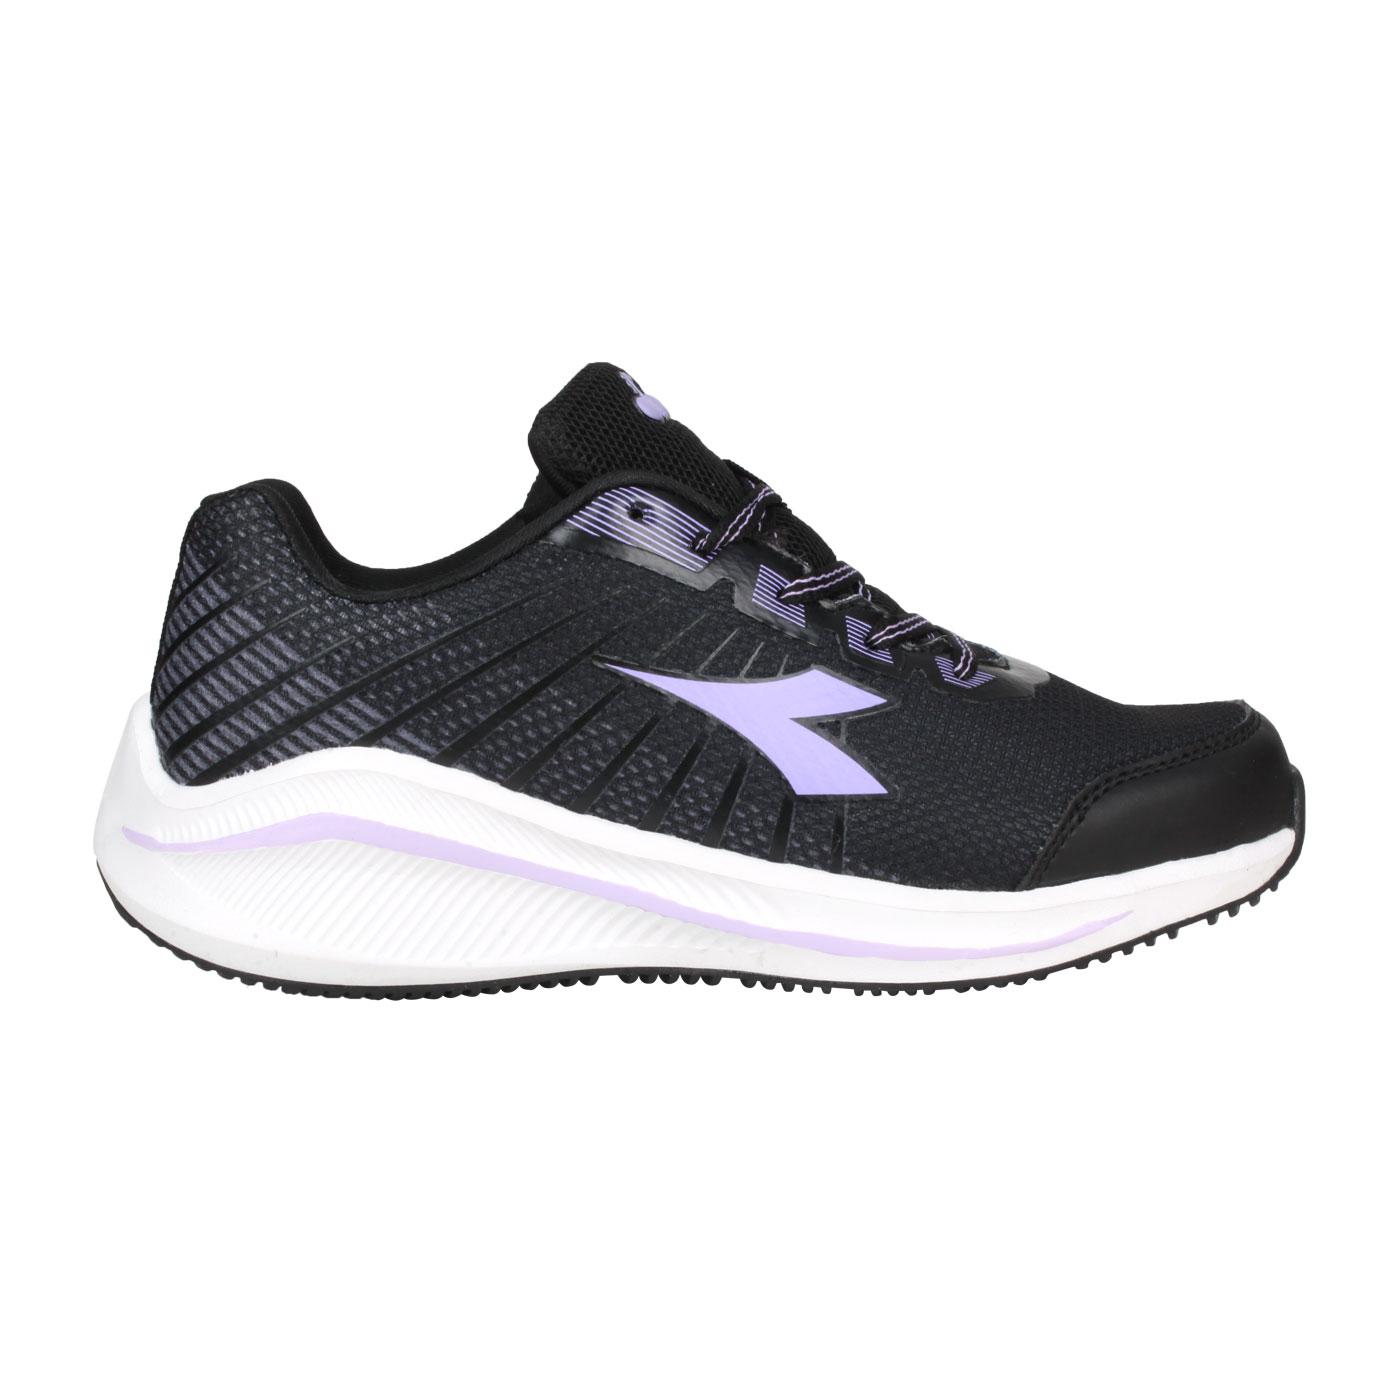 DIADORA 女款專業輕量慢跑鞋 DA31629 - 黑粉紫